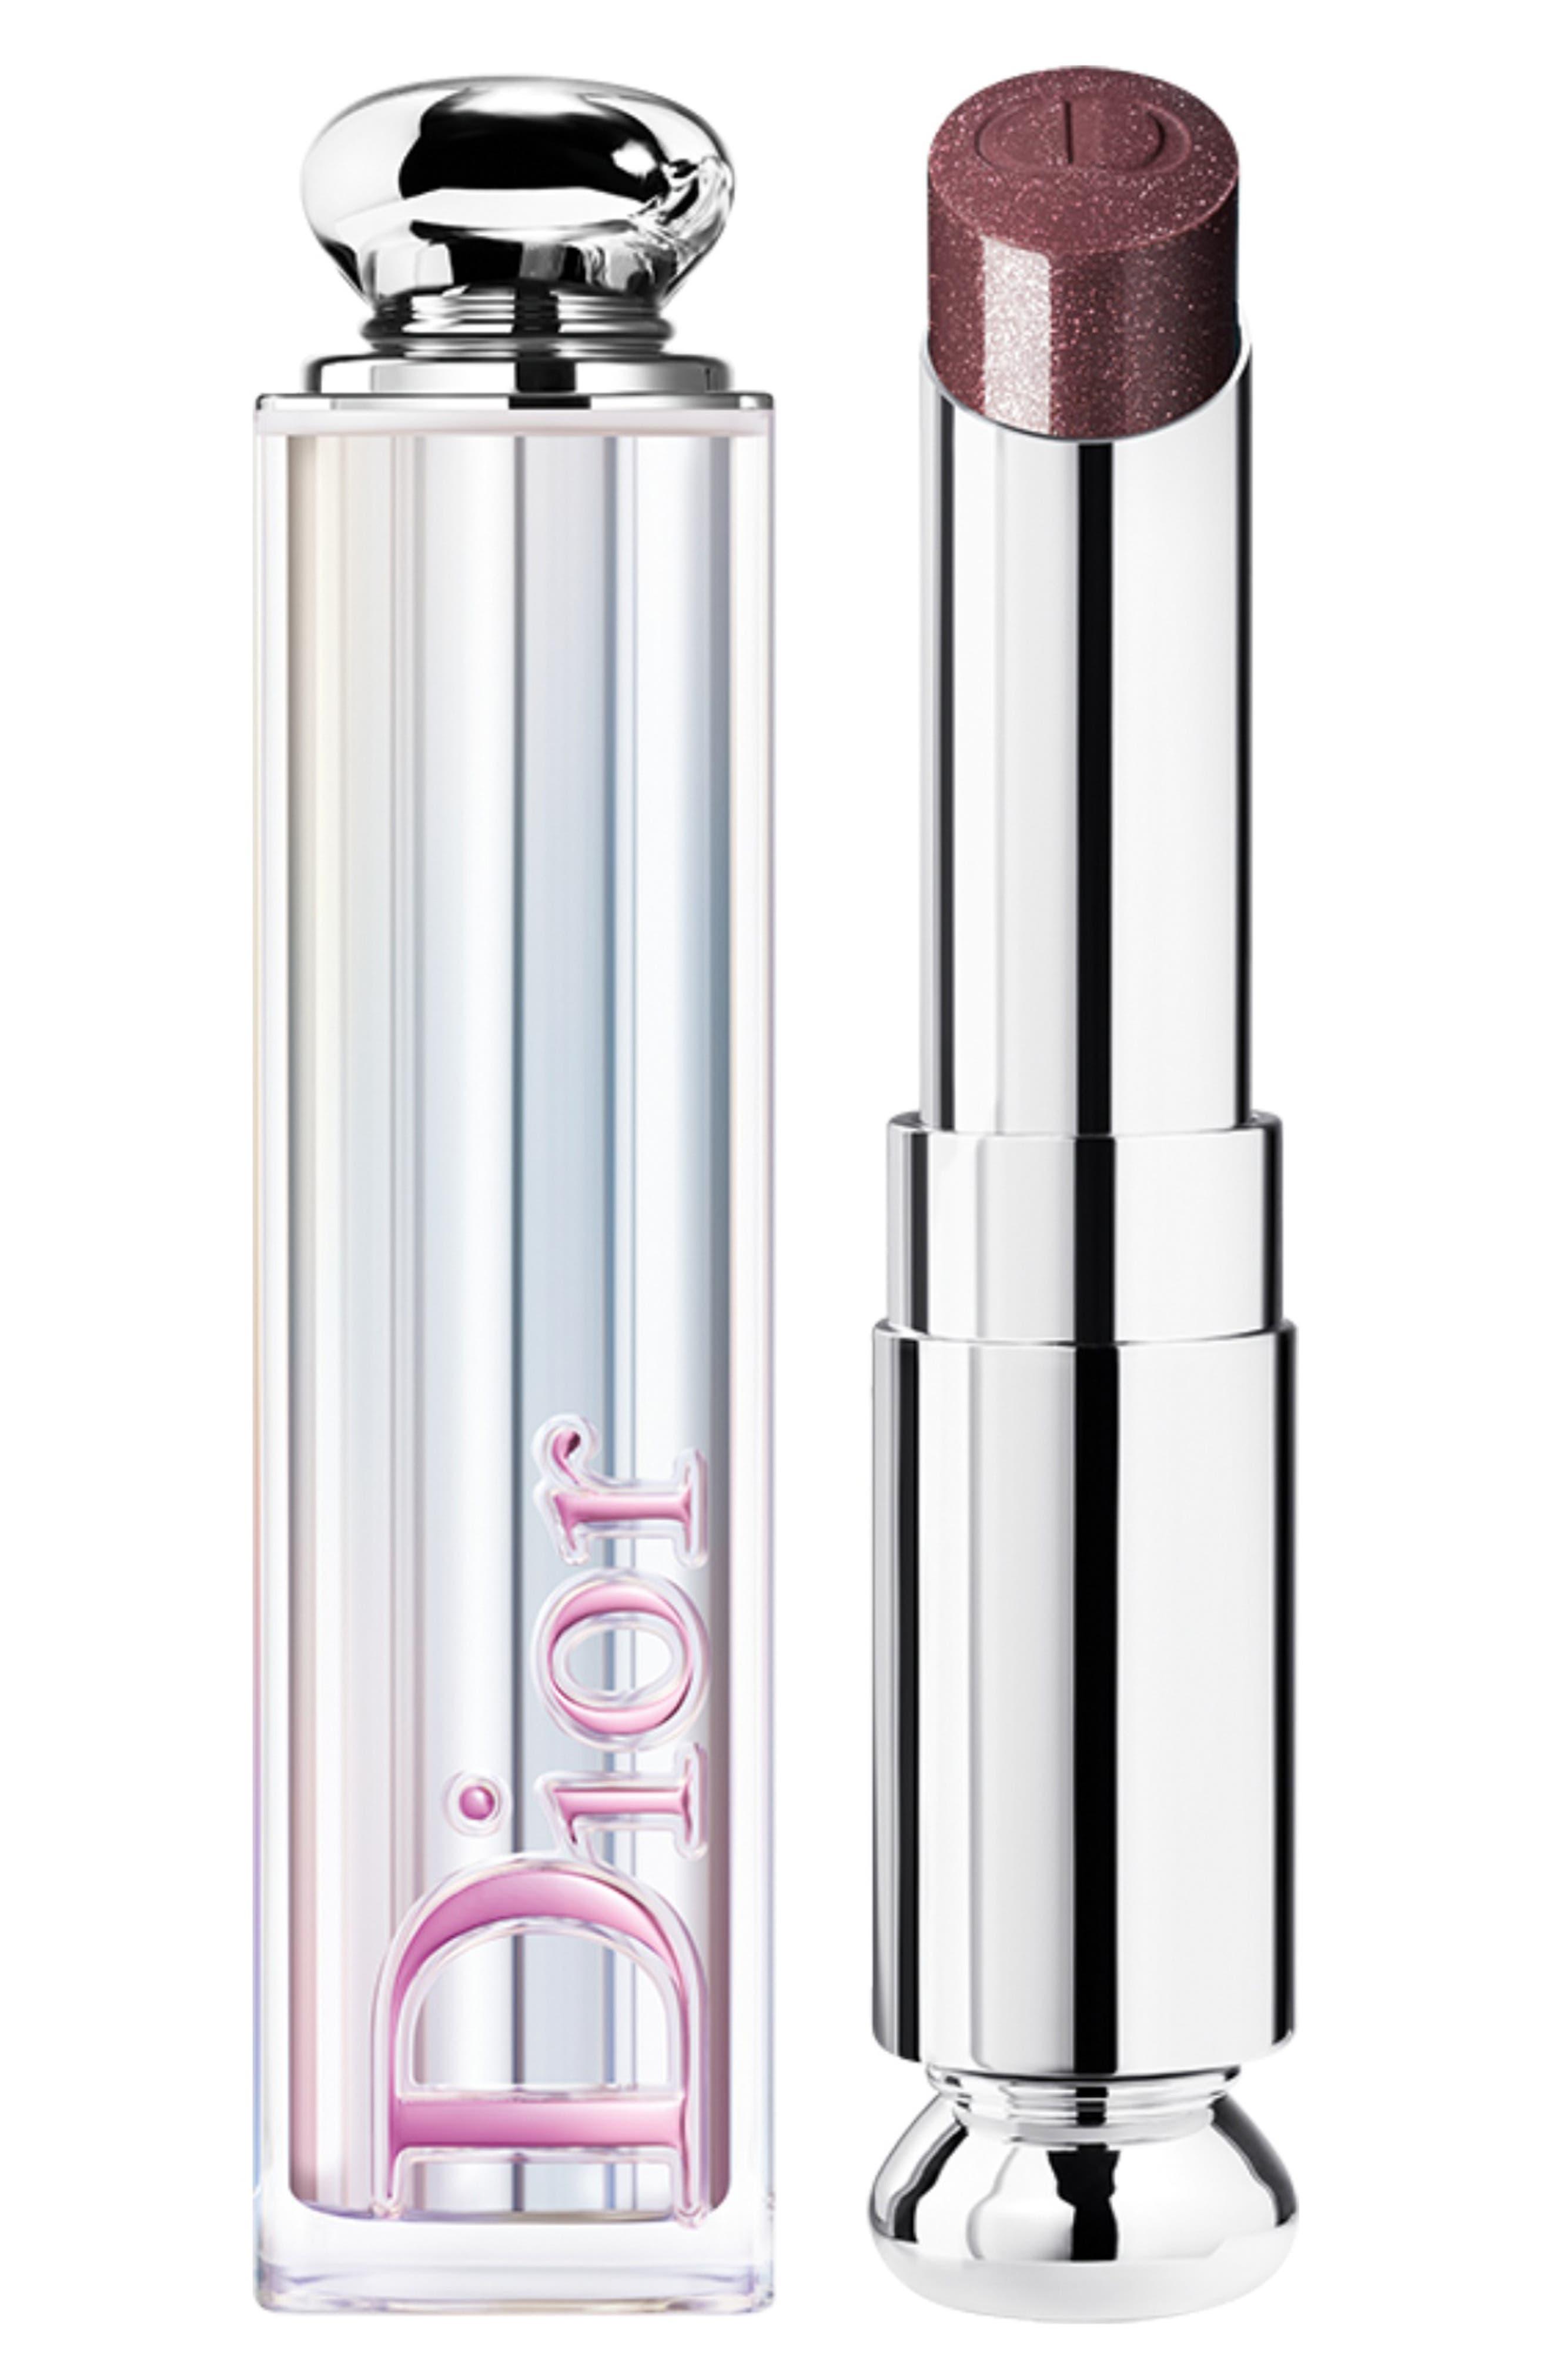 Dior Addict Stellar Shine Lipstick - 612 Sideral